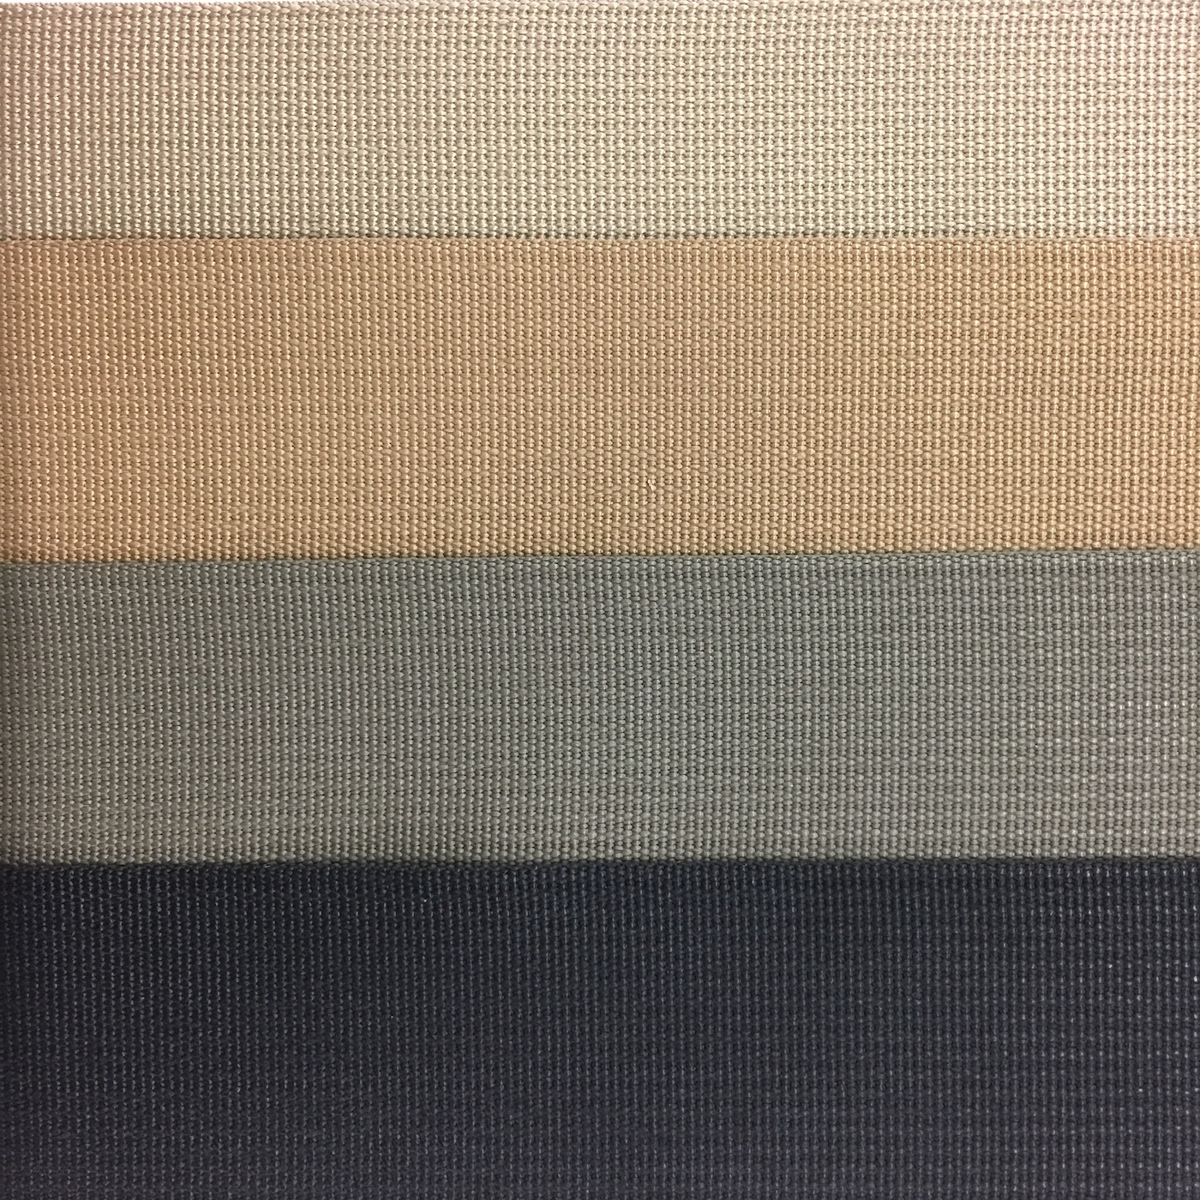 1 Mil-Spec Nylon Grosgrain Ribbon MIL-PRF-5038 By the Yard Tan 499